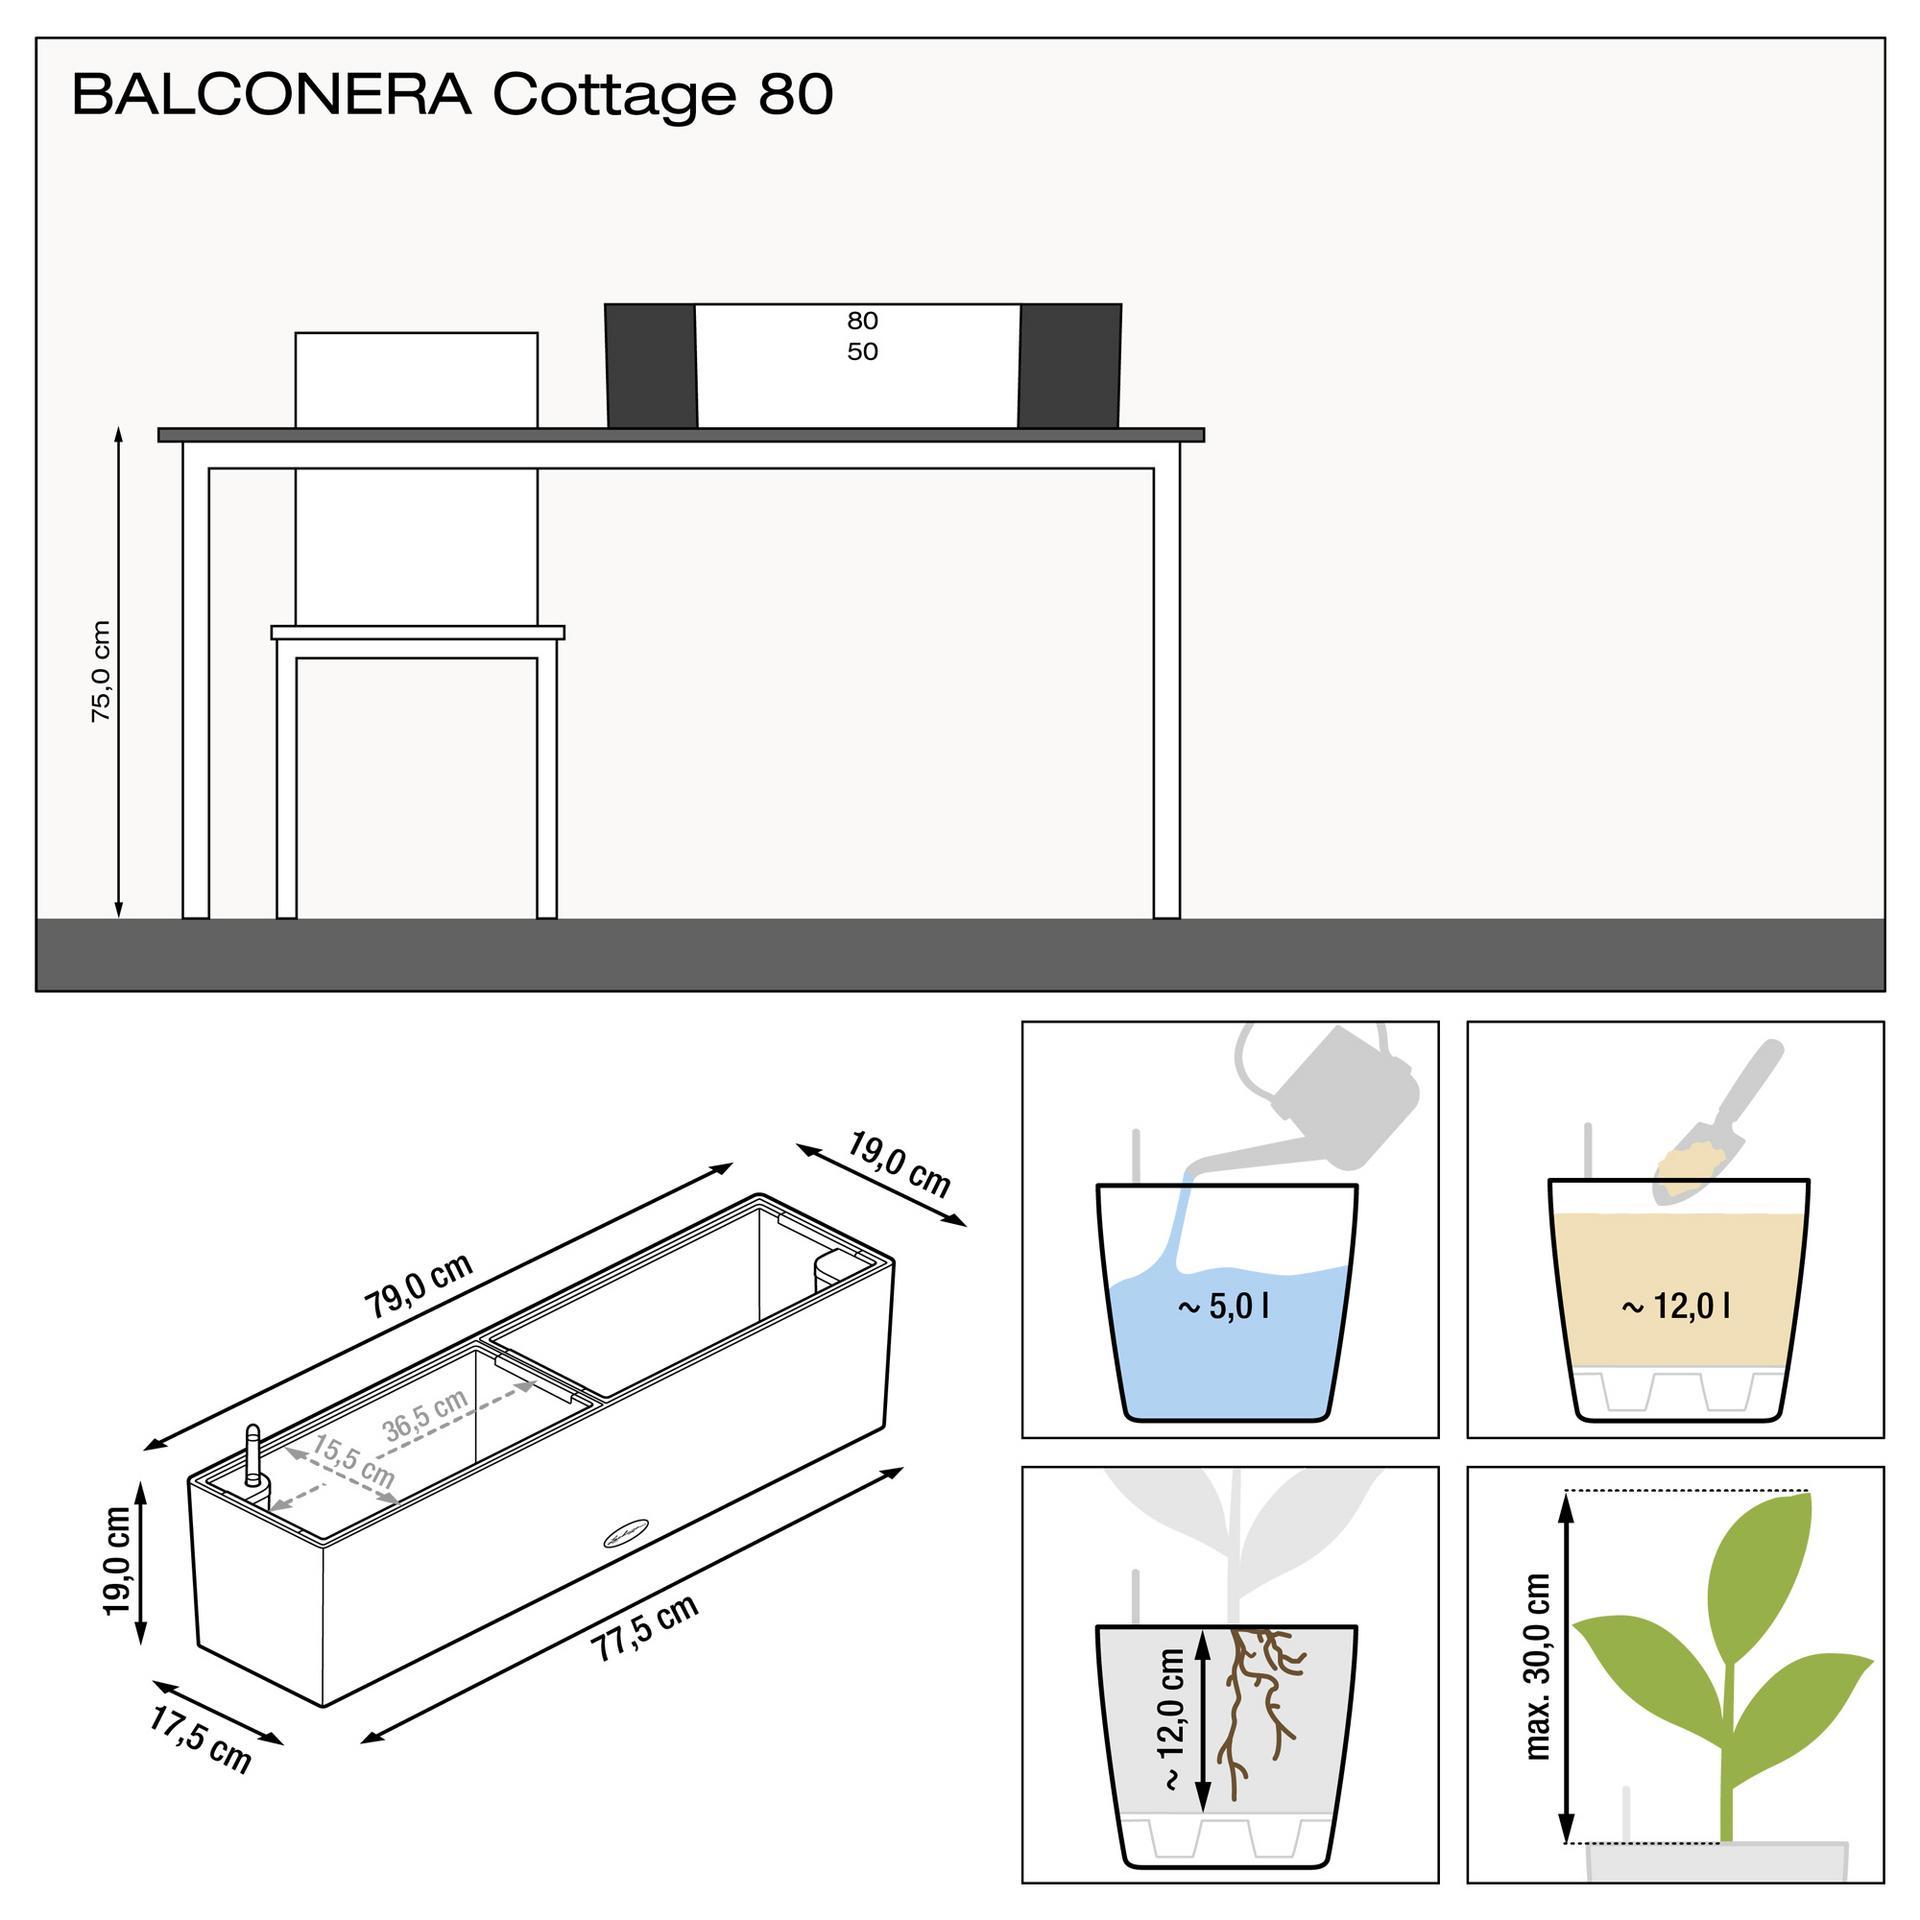 le_balconera-cottage80_product_addi_nz